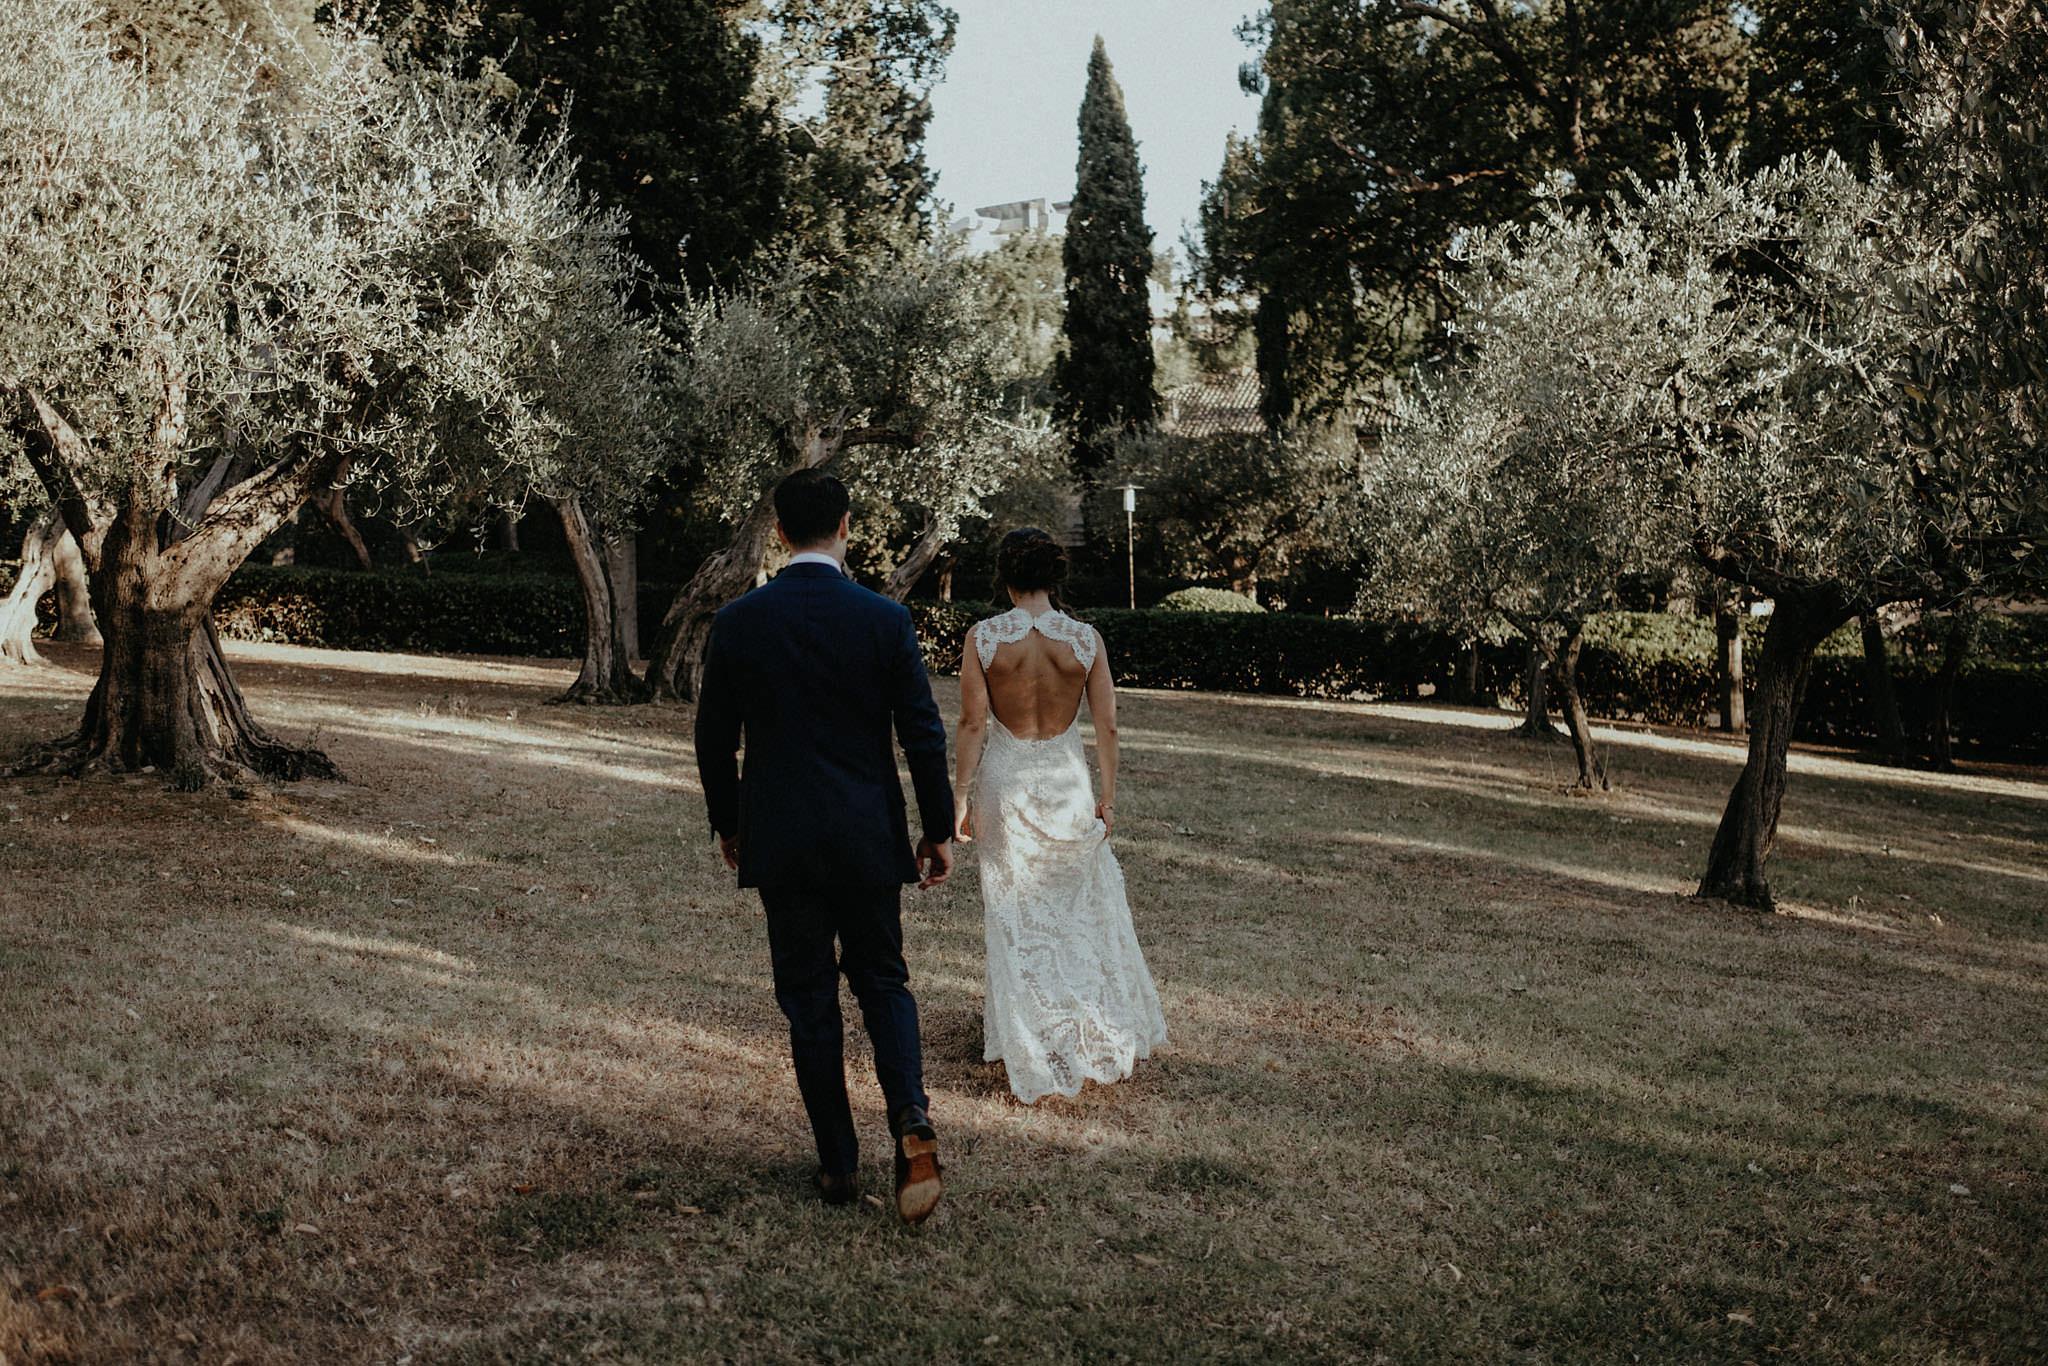 Max-Steph-Italy-Wedding-548.jpg